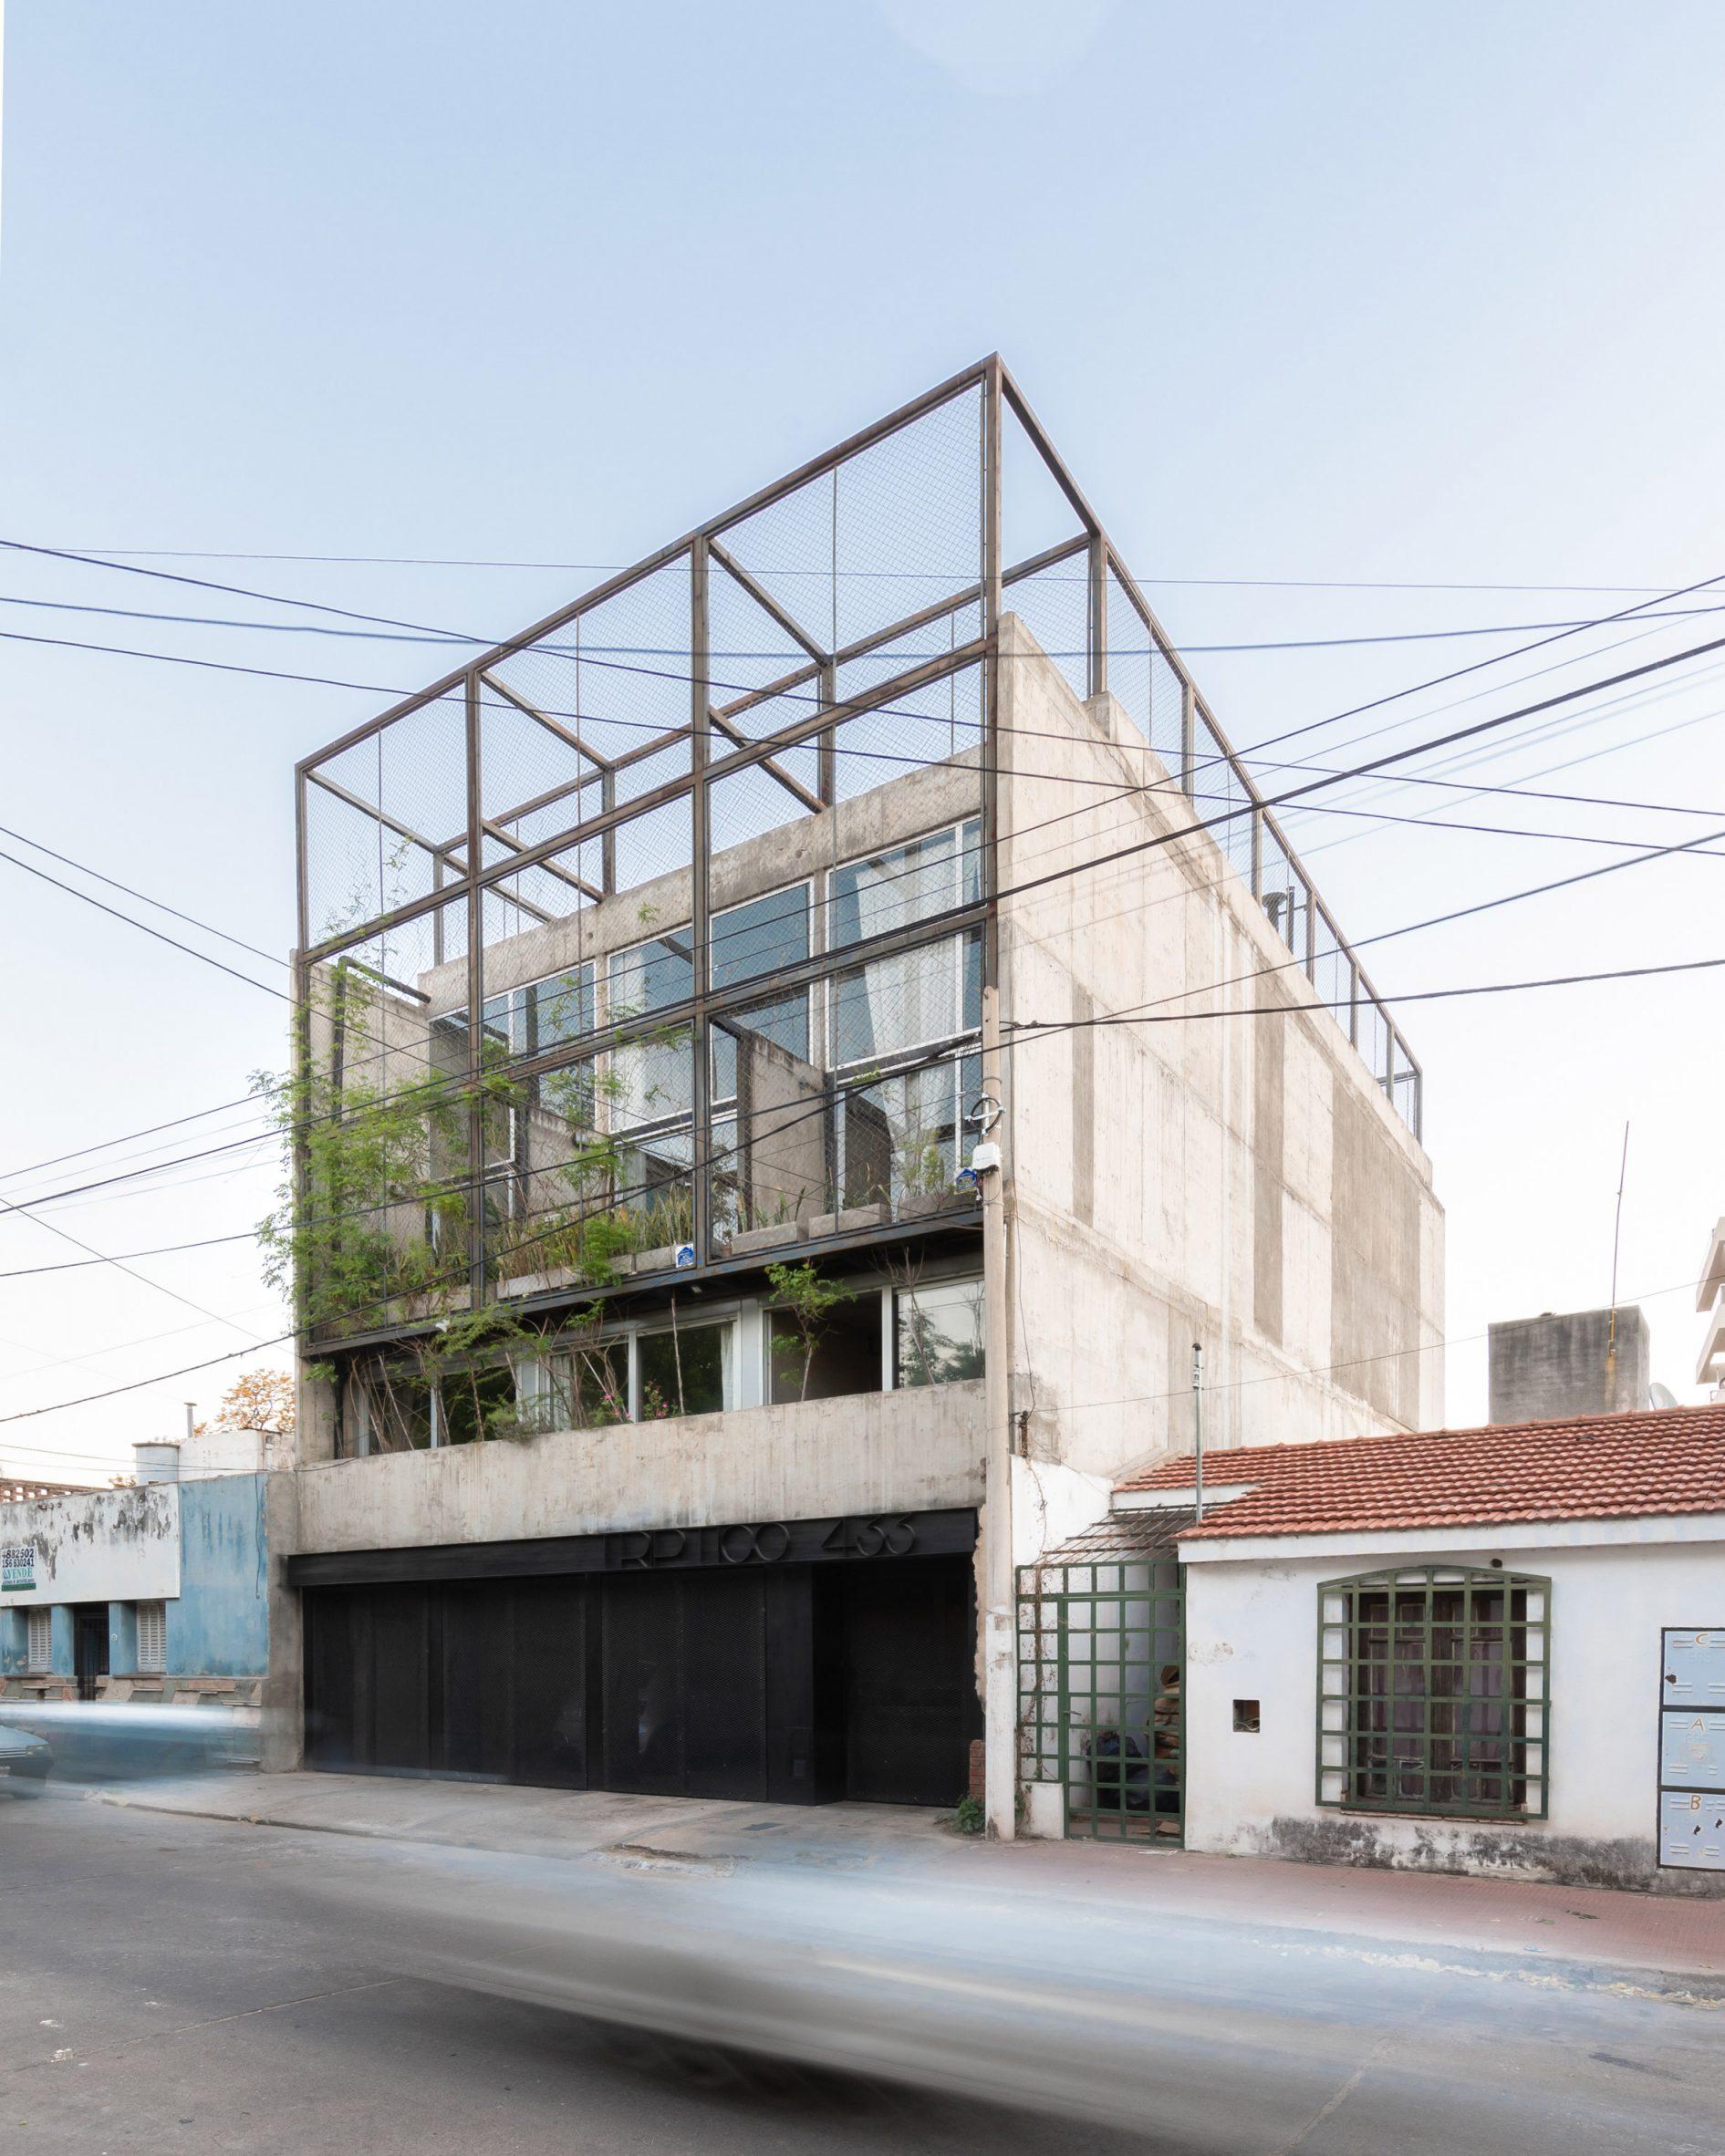 Architects Mariela Marchisio, Cristián Nanzer and Germán Margherit designed The Tríptico Building